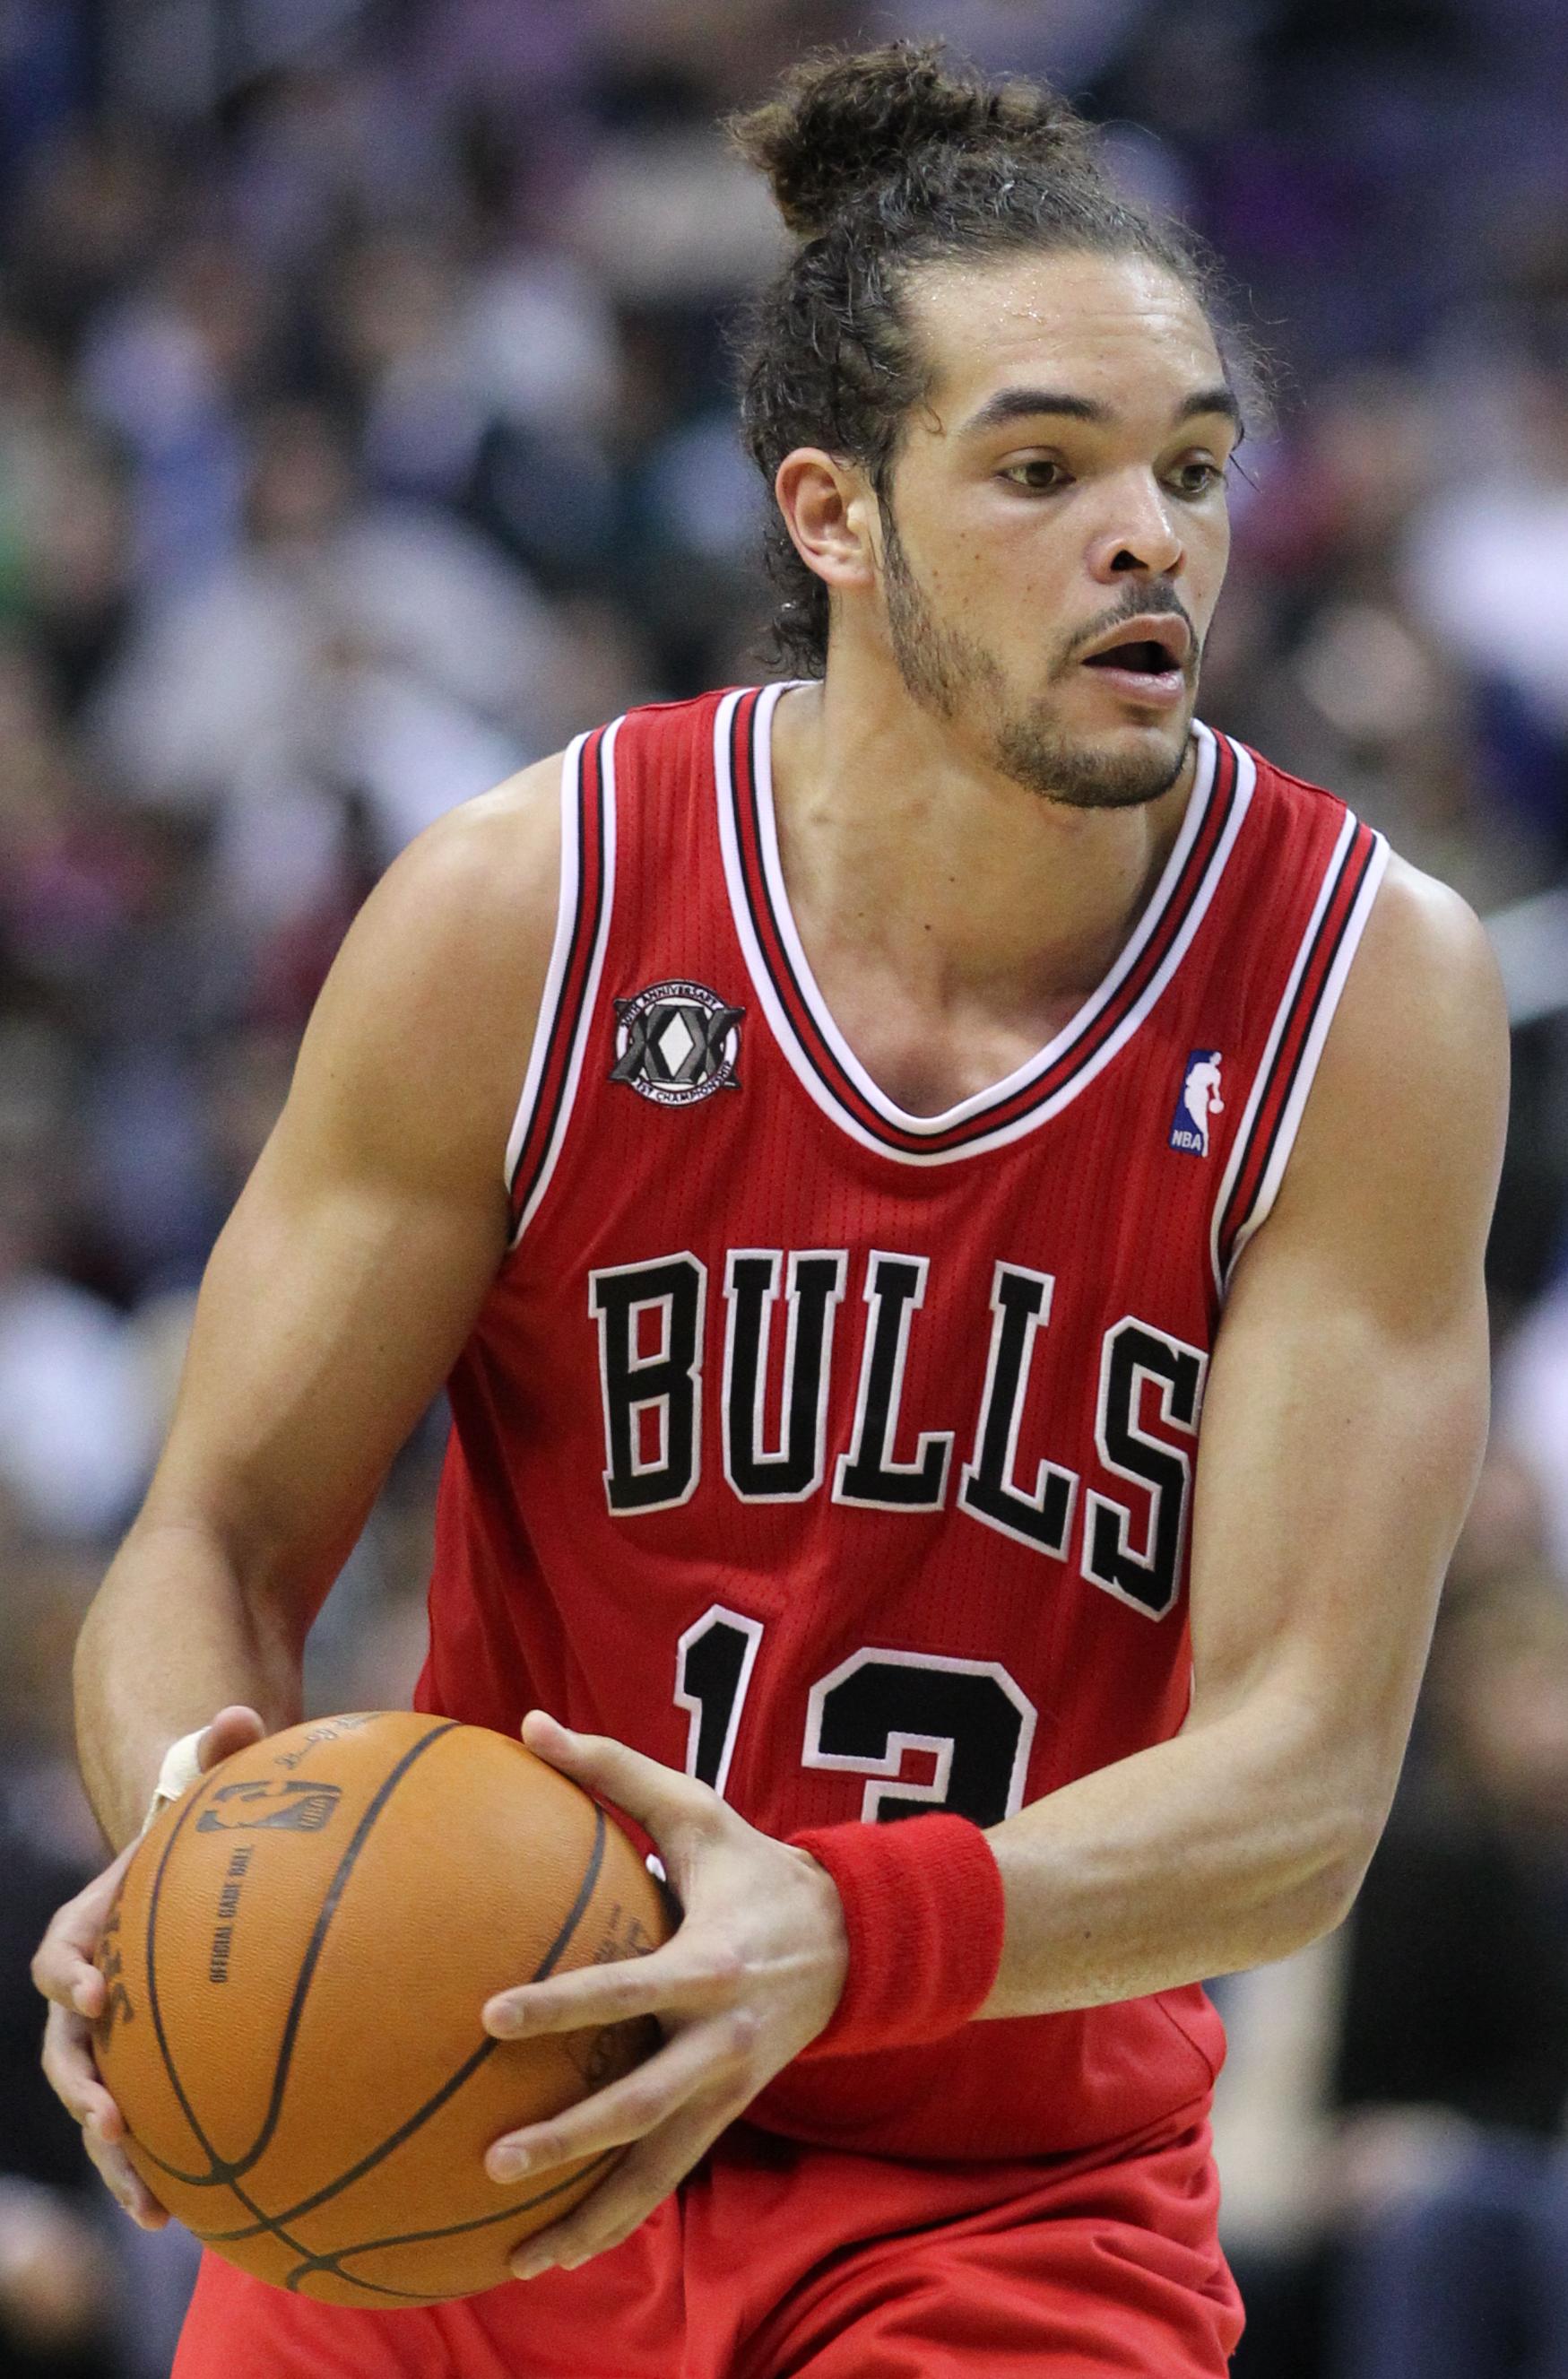 43462e689 Chicago Bulls - Wikiwand